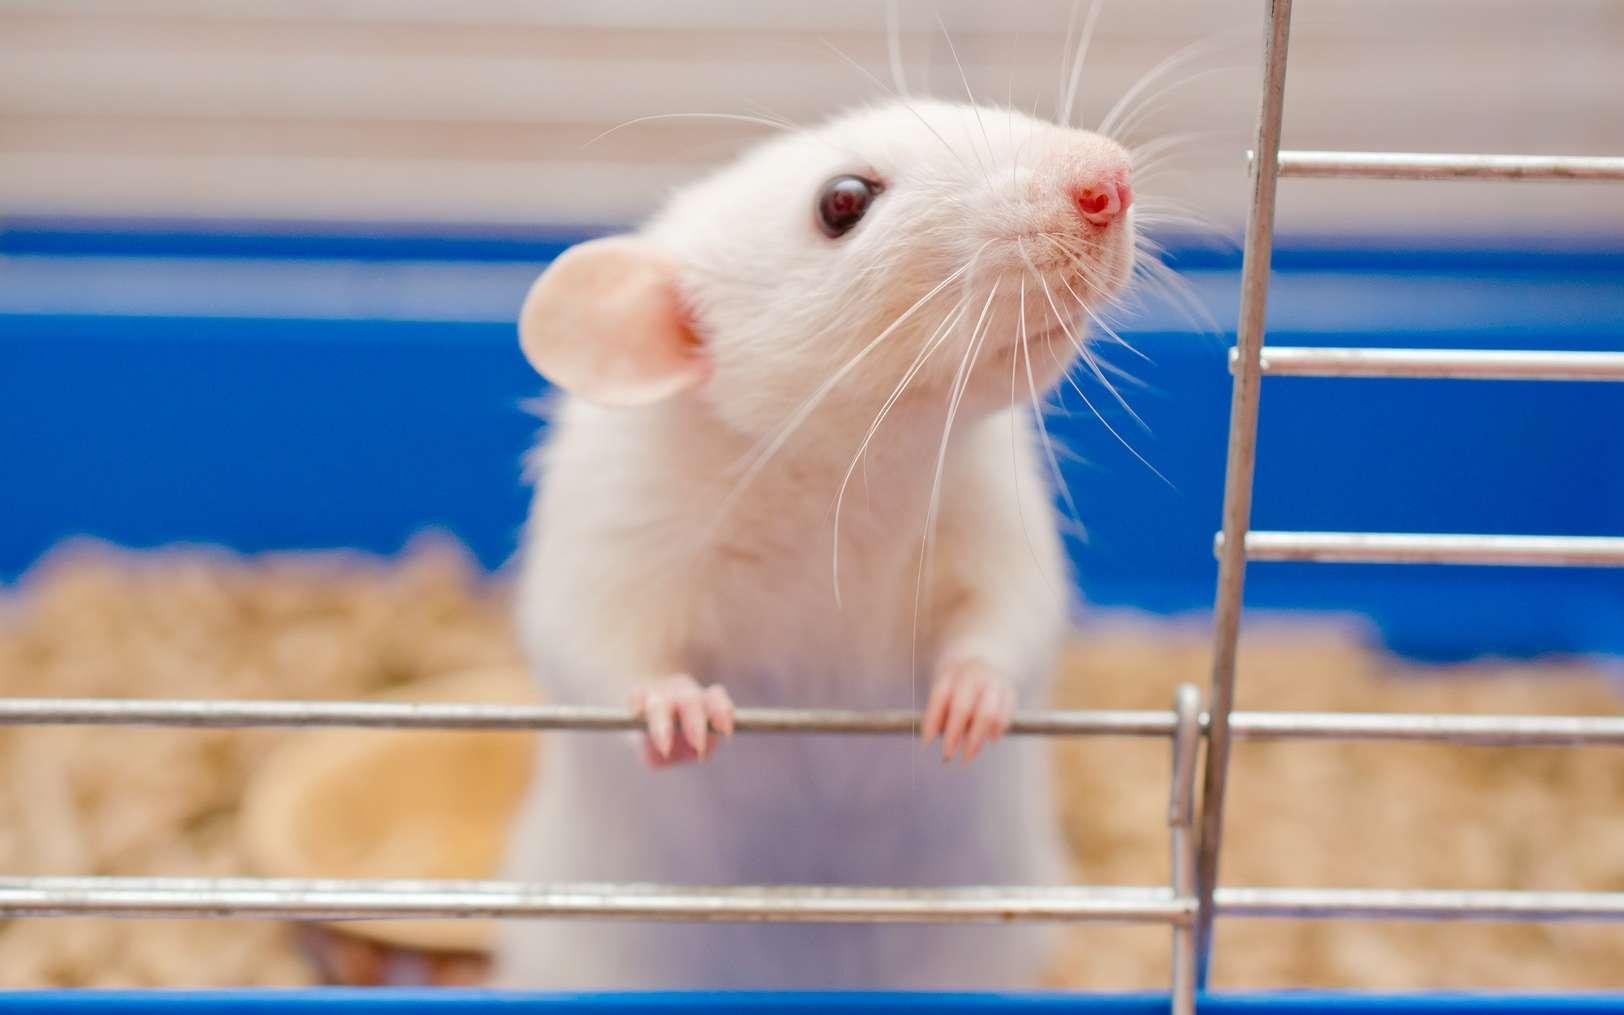 Peut-on se passer des tests sur les animaux ? © Kirill Kurashov, Fotolia